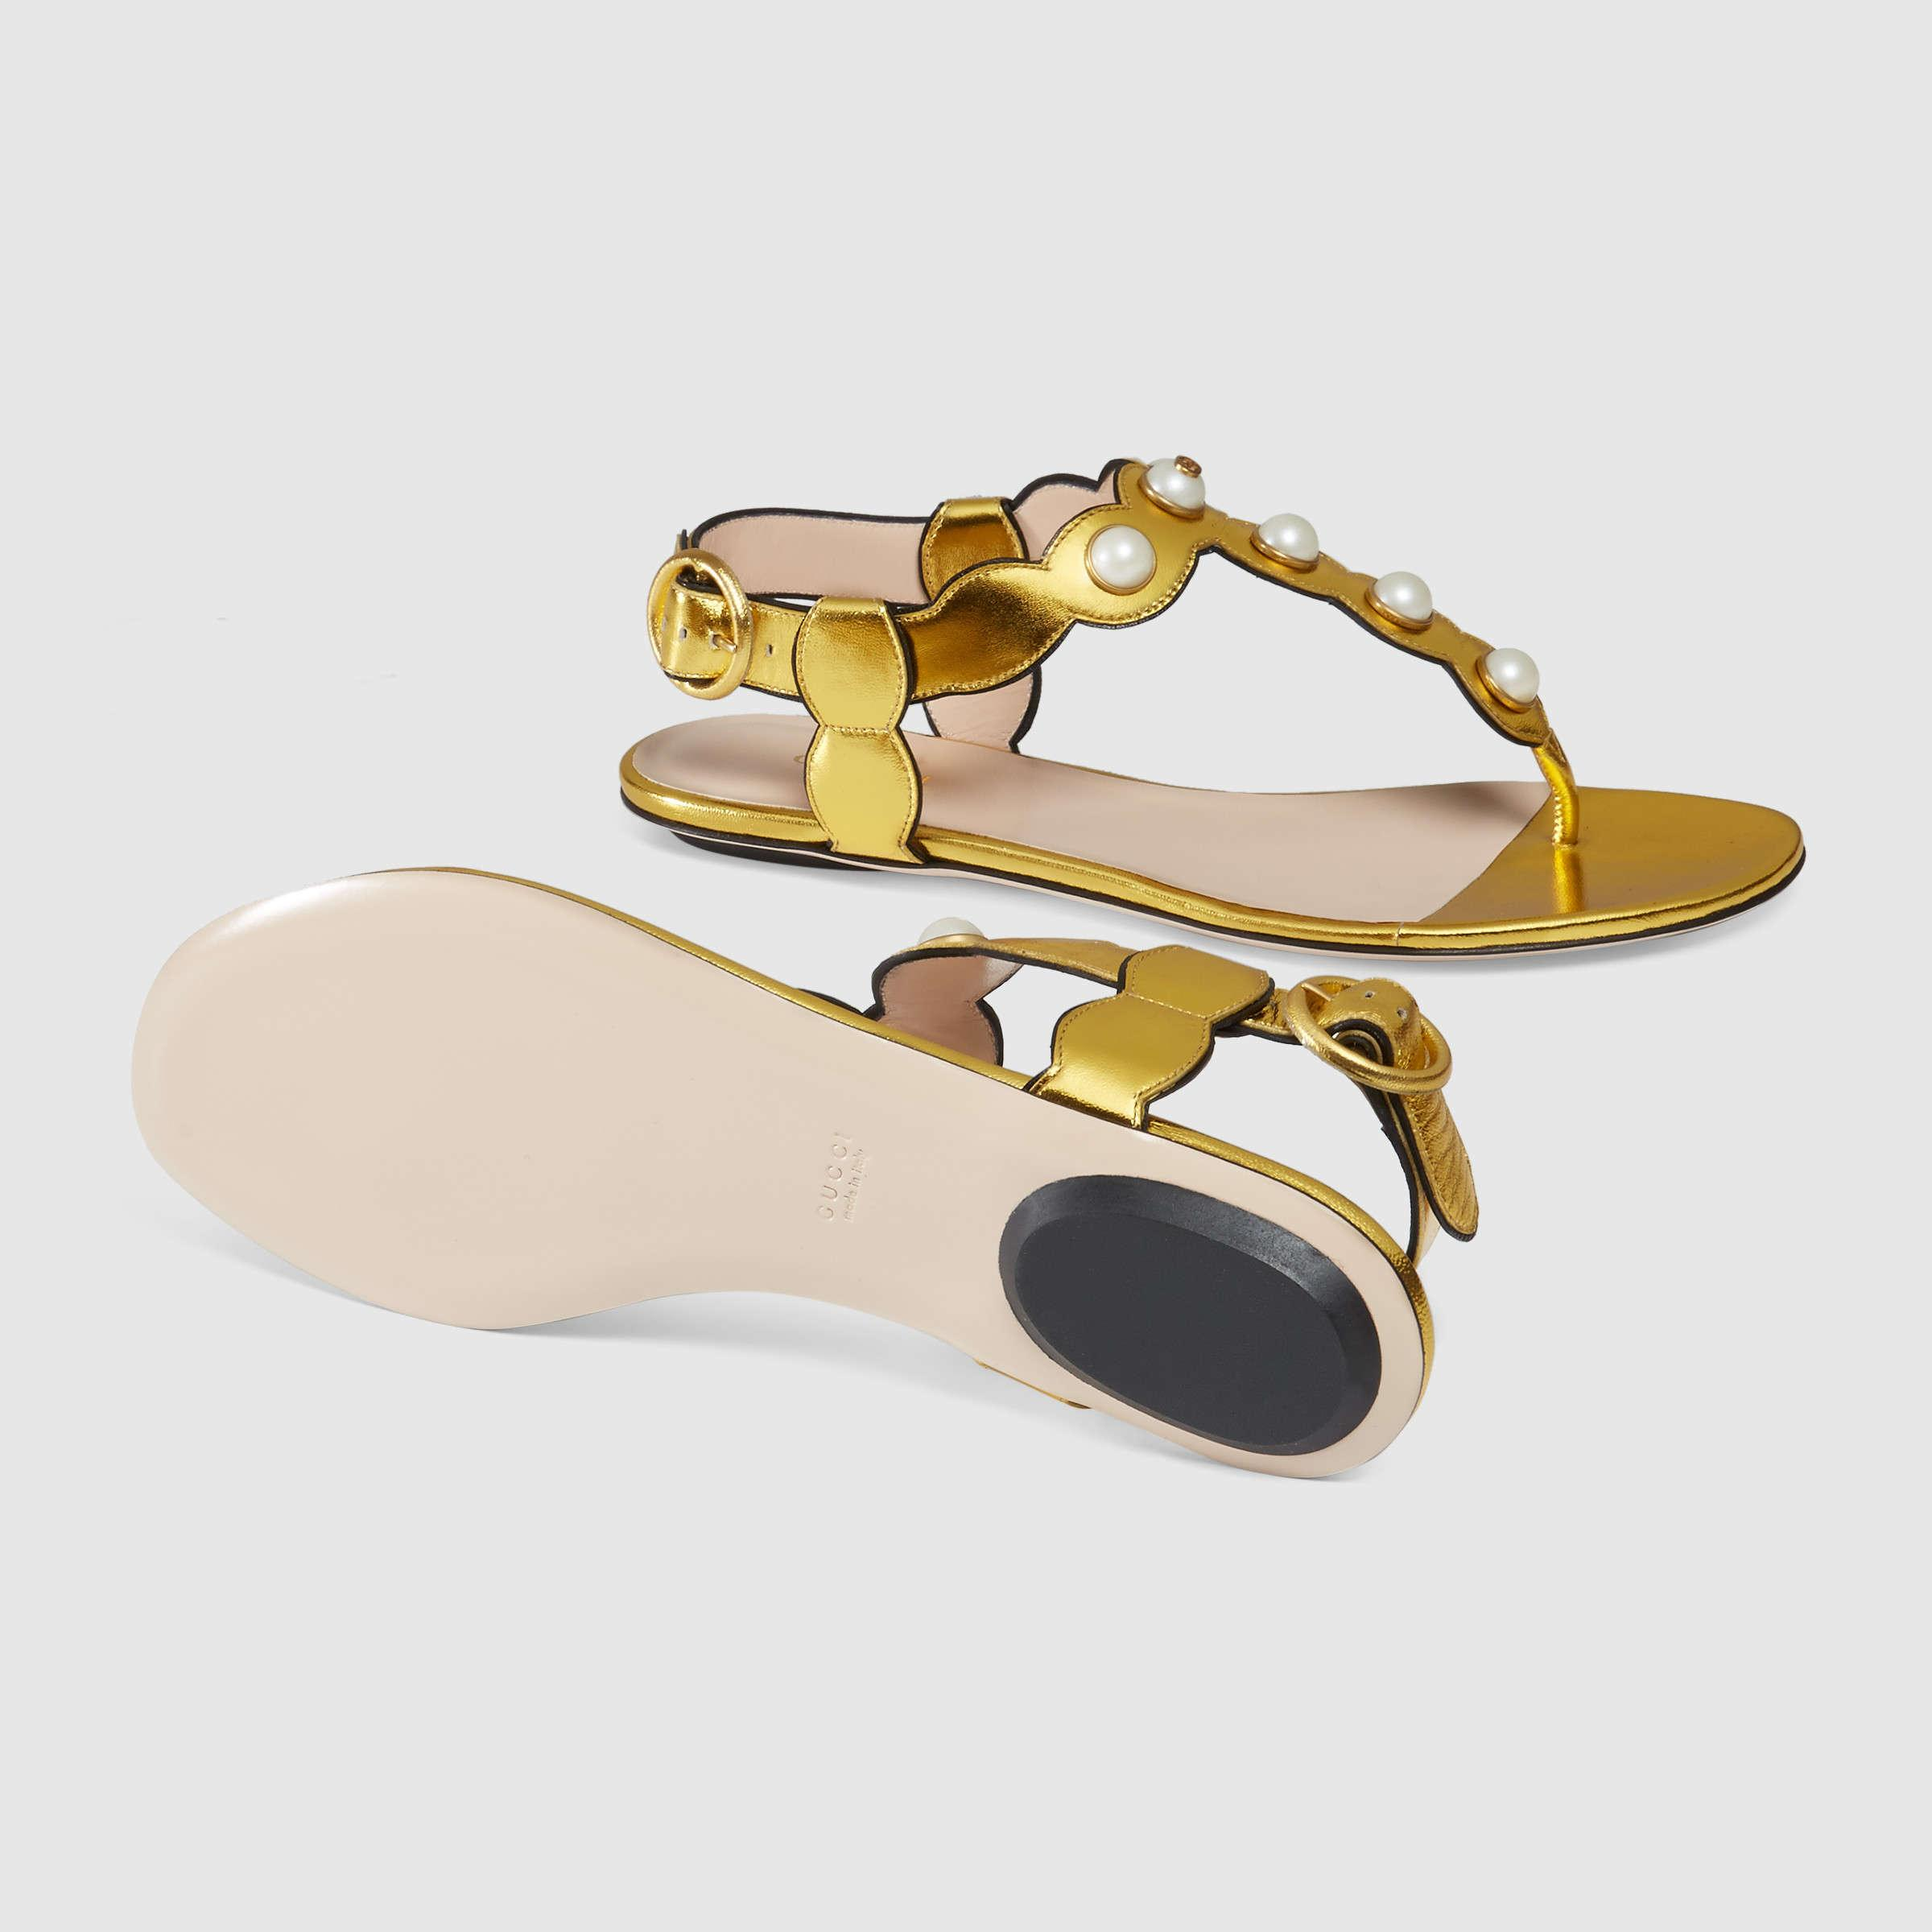 d28bf87da8901c Lyst - Gucci Embellished Metallic-Leather Sandals in Metallic